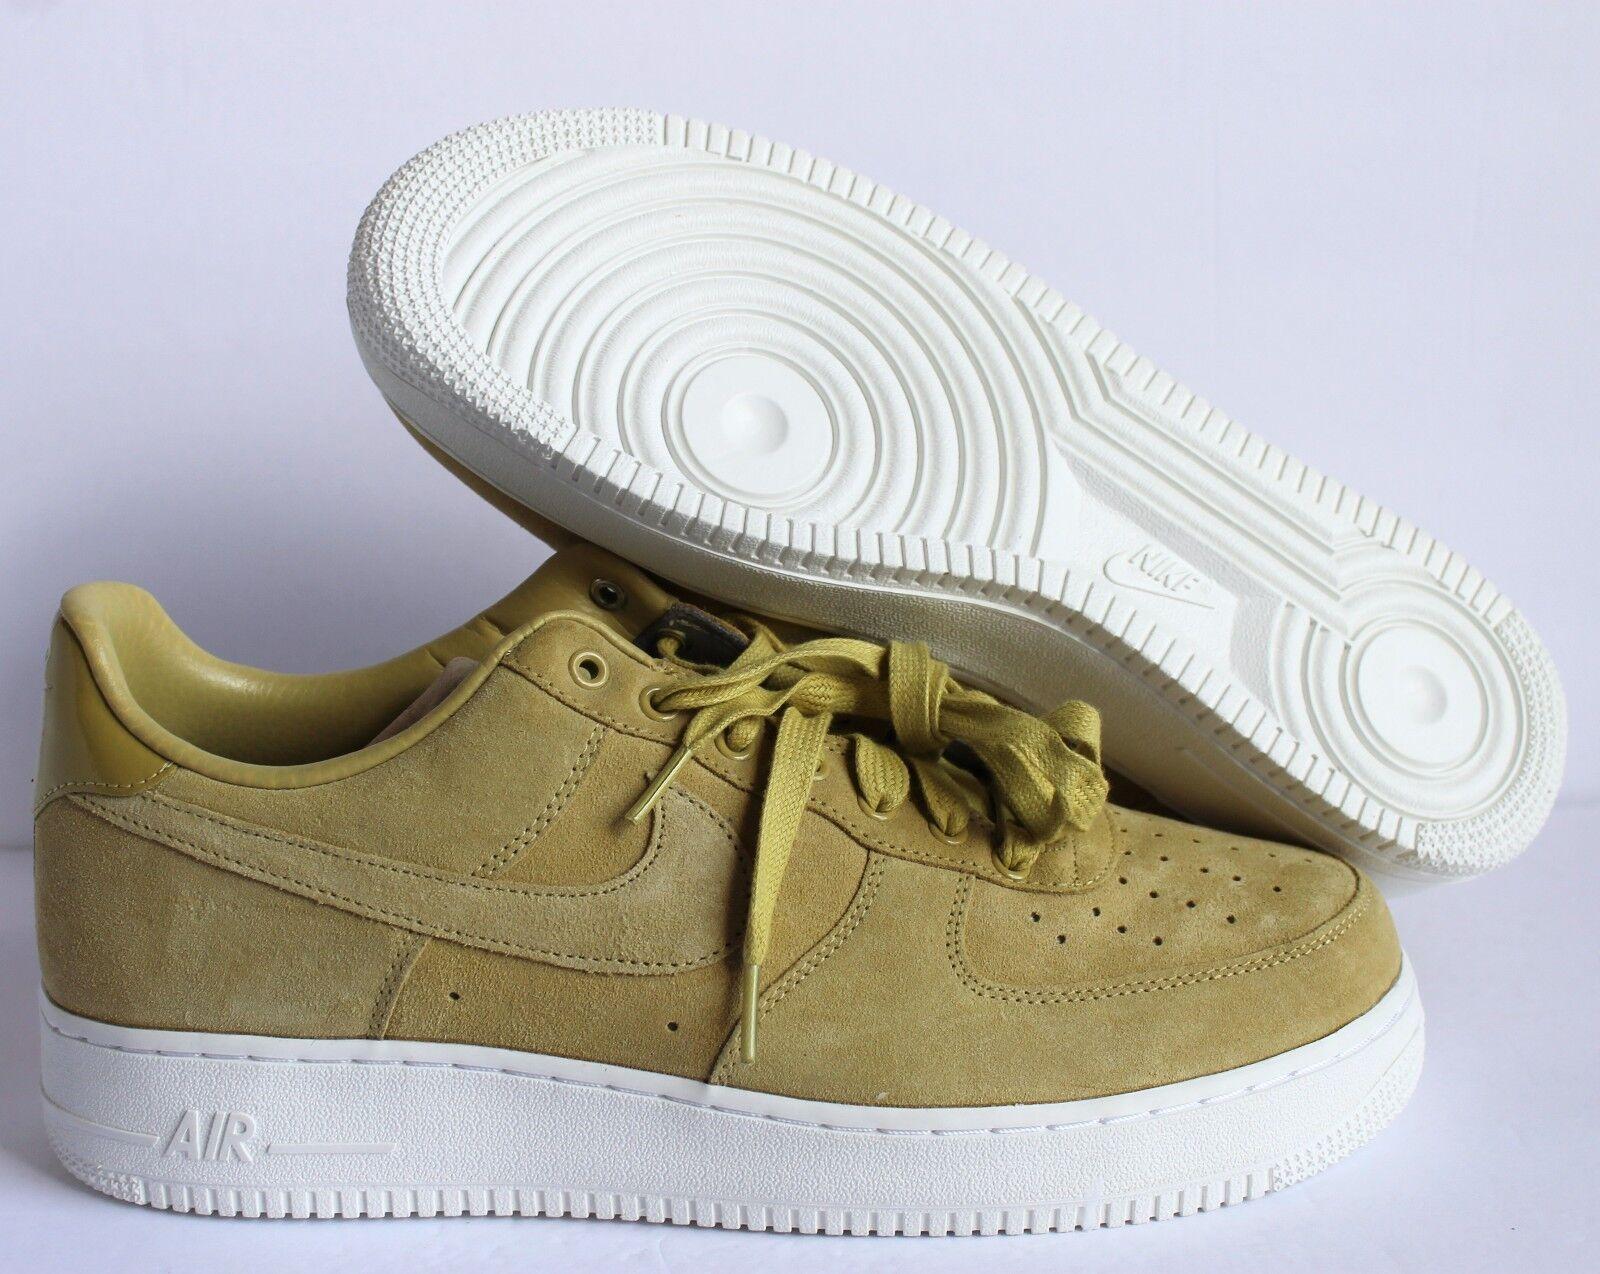 Nike homme Air Obliger One faible Suede [AQ3661-991] ID vert-blanc sz 12 [AQ3661-991] Suede 606cb7